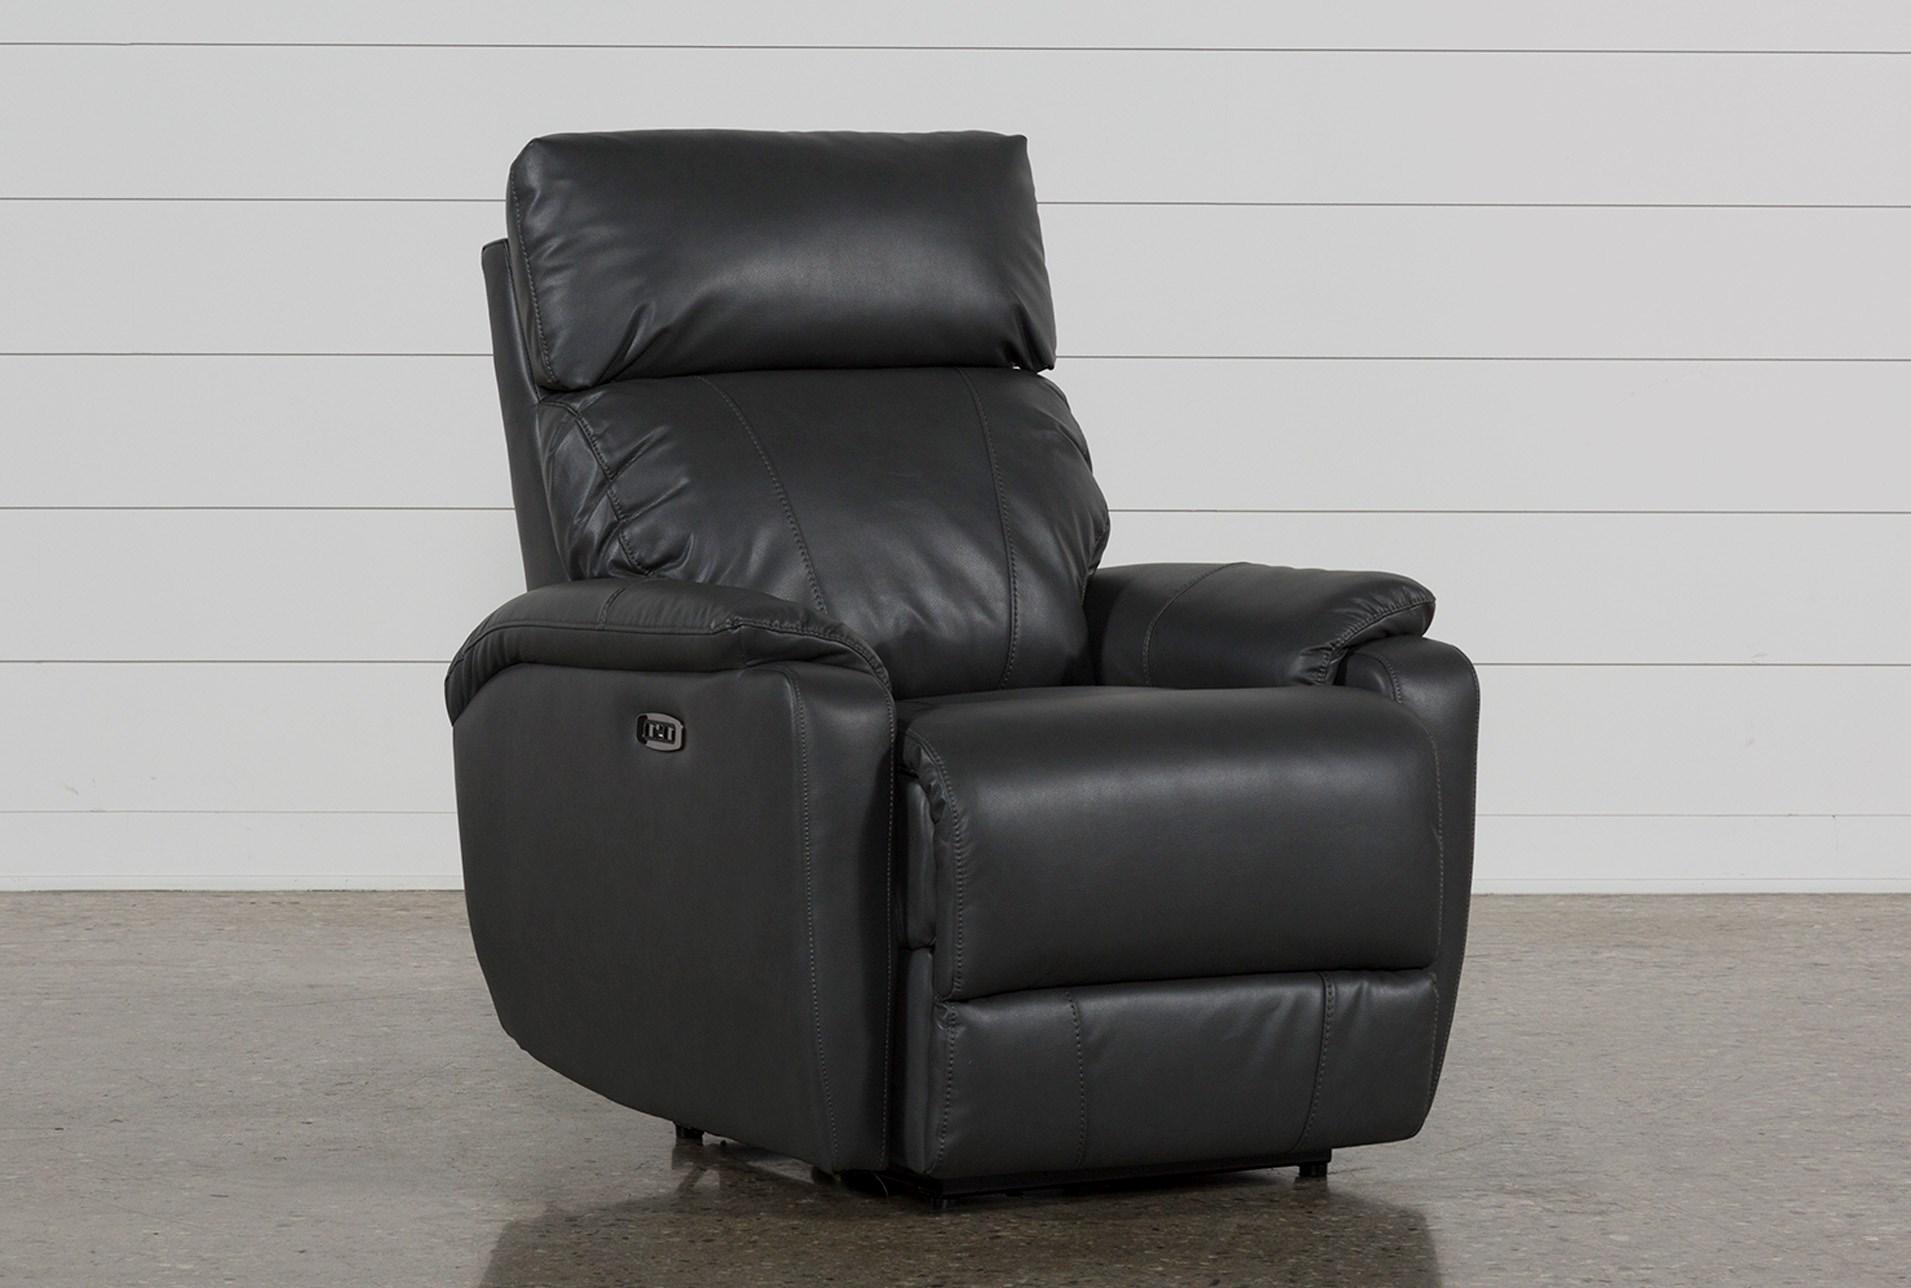 Marvelous Connie Smoke Power Recliner With Power Headrest Usb Machost Co Dining Chair Design Ideas Machostcouk